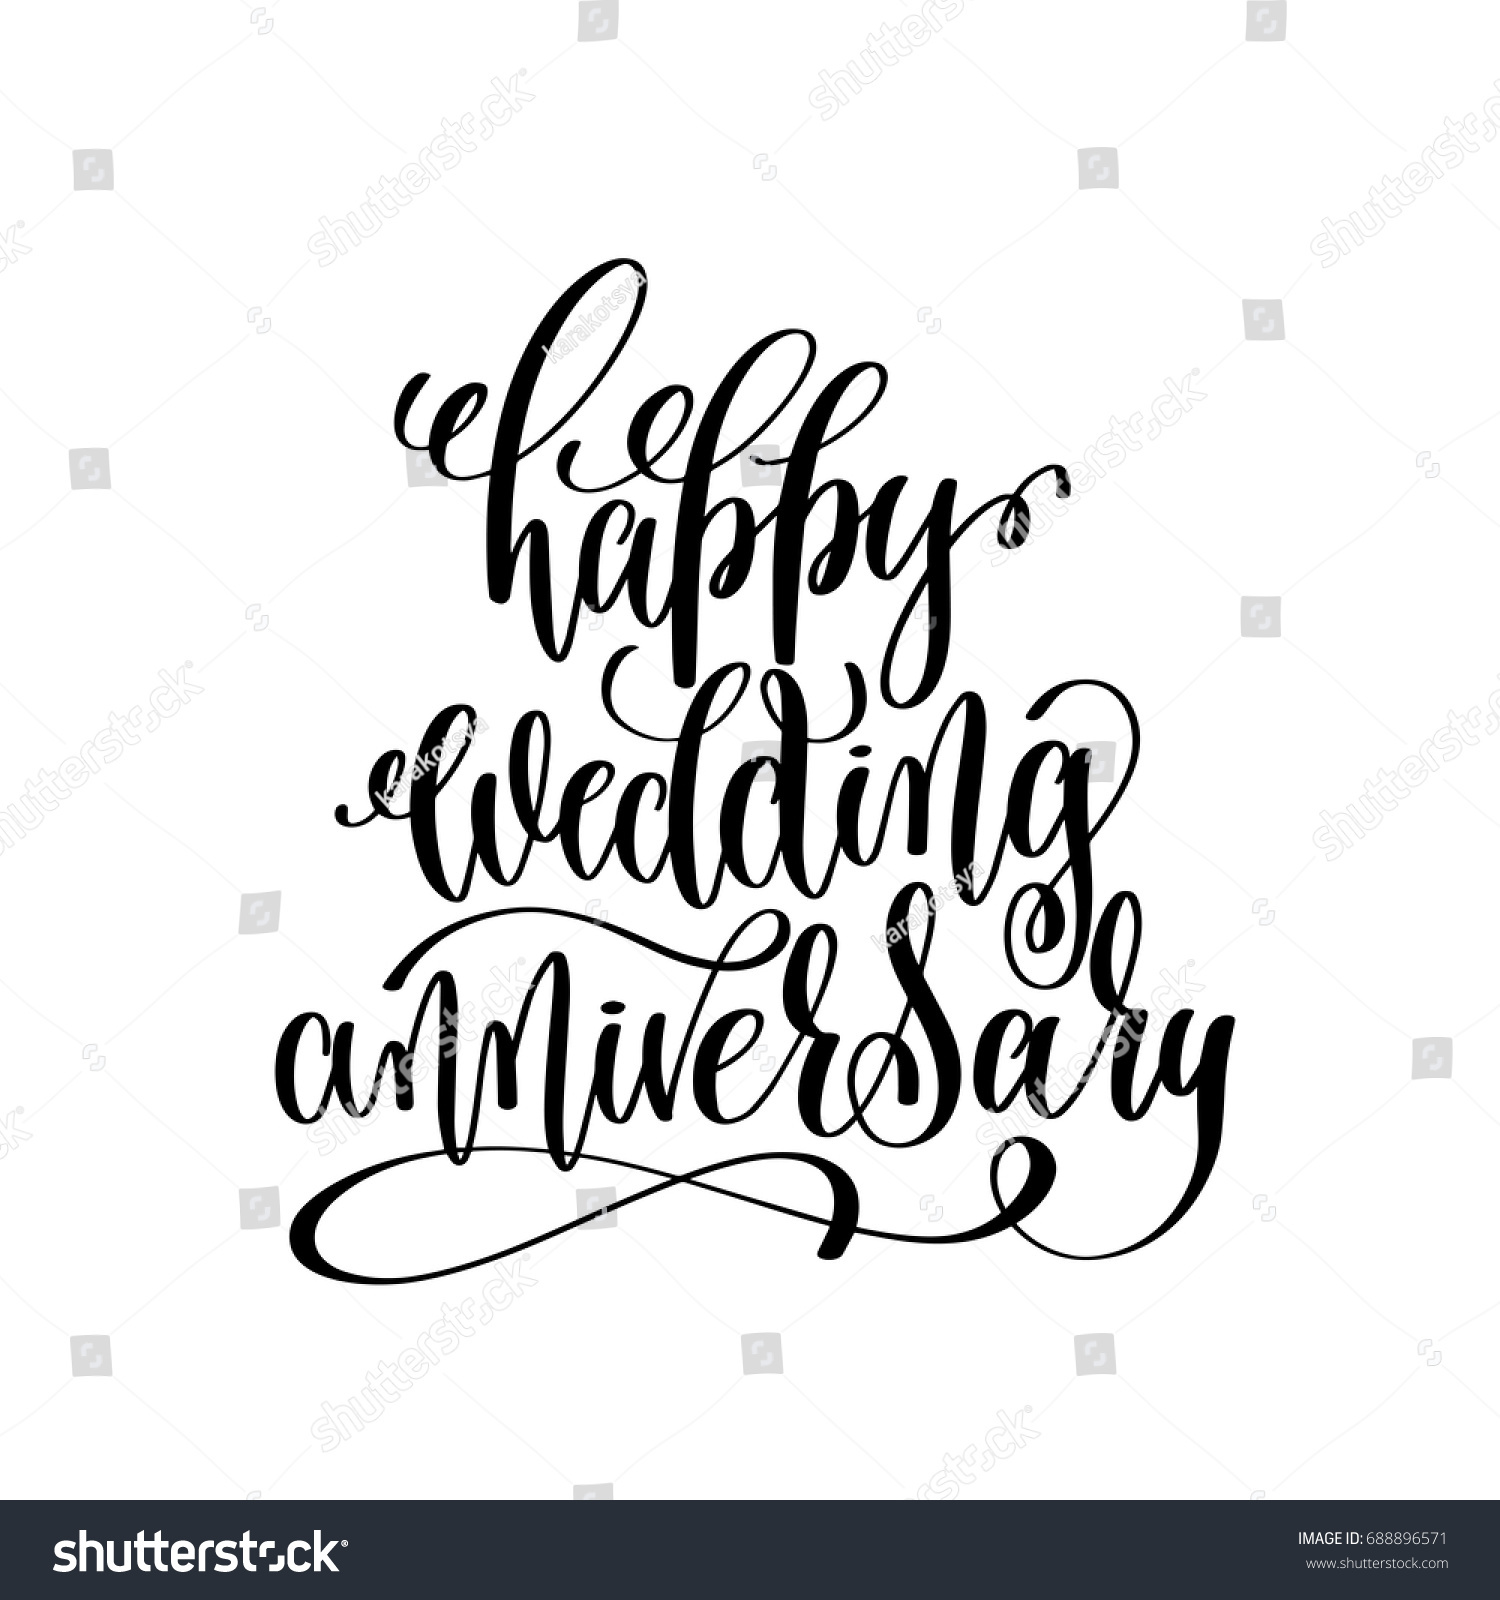 Happy wedding anniversary black white hand stock vector